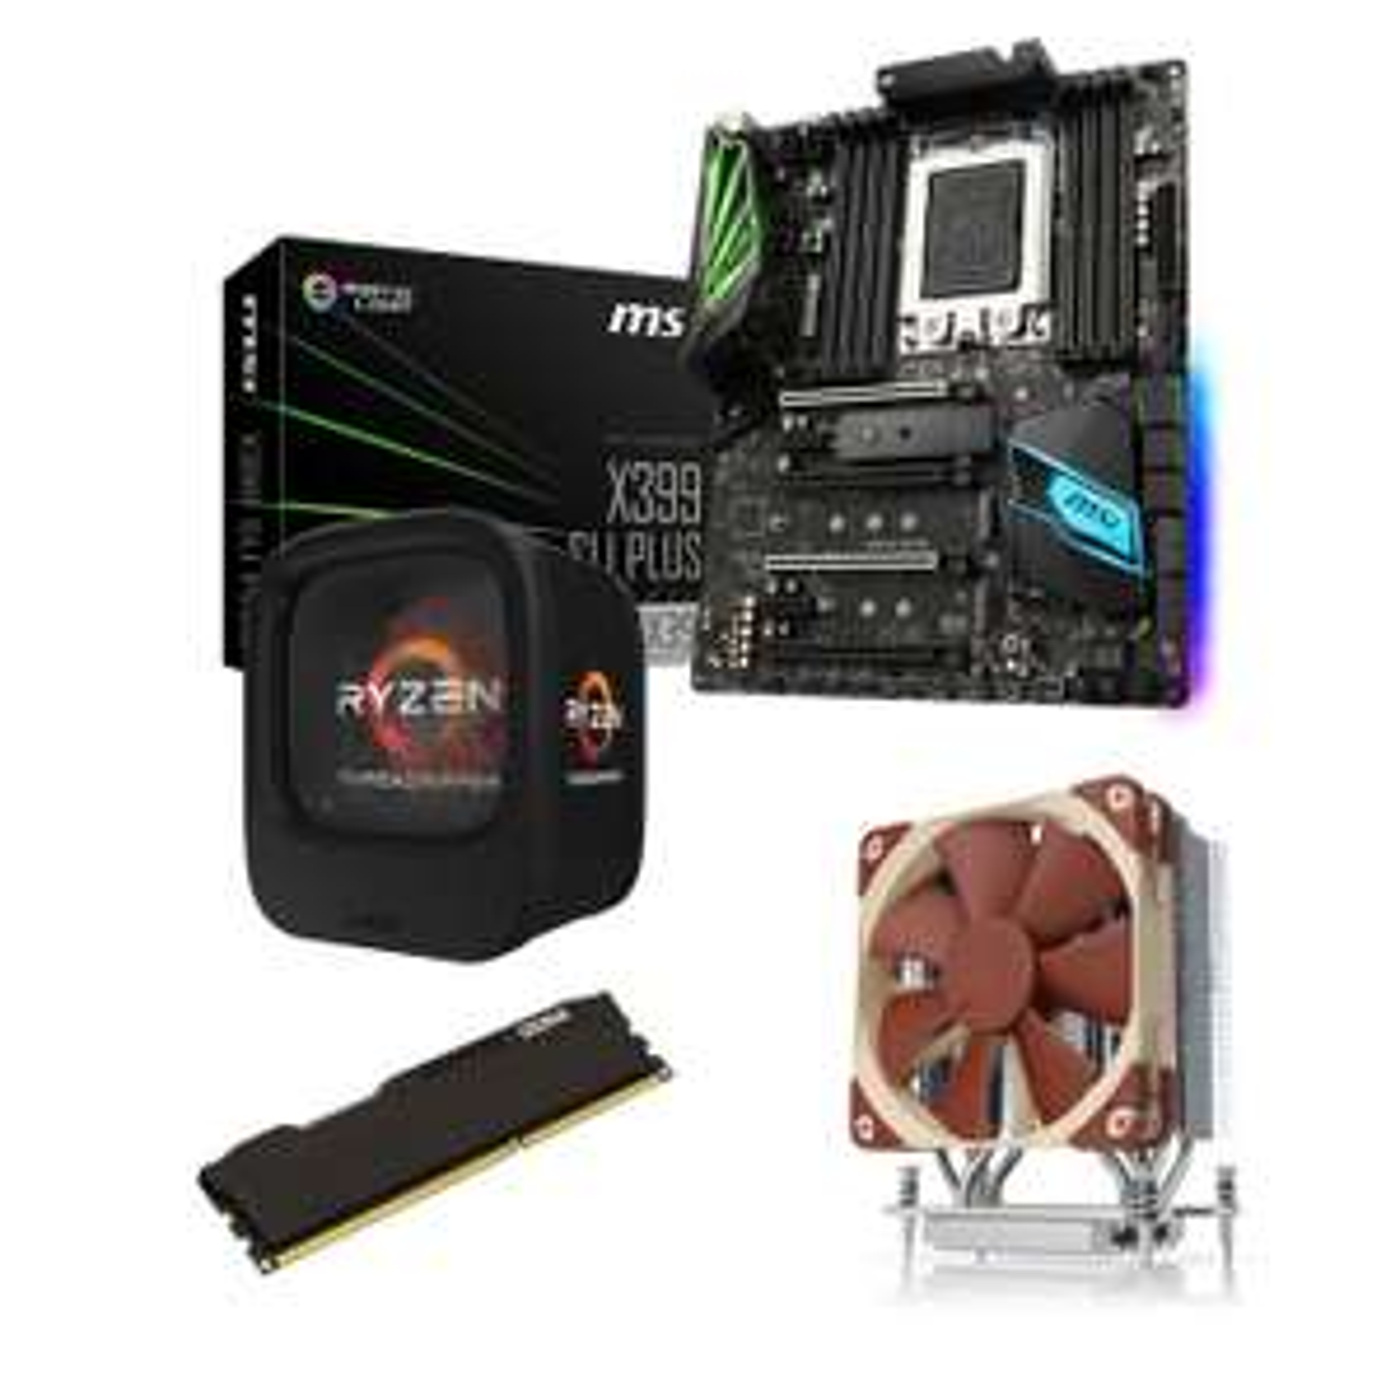 [Expiré] Kit Upgrade PC AMD Ryzen Threadripper : Carte mère ATX Socket sTR4 AMD X399 + CPU AMD Ryzen Threadripper 1950X (3.4 GHz) + RAM 32 Go DDR4 + Ventilateur